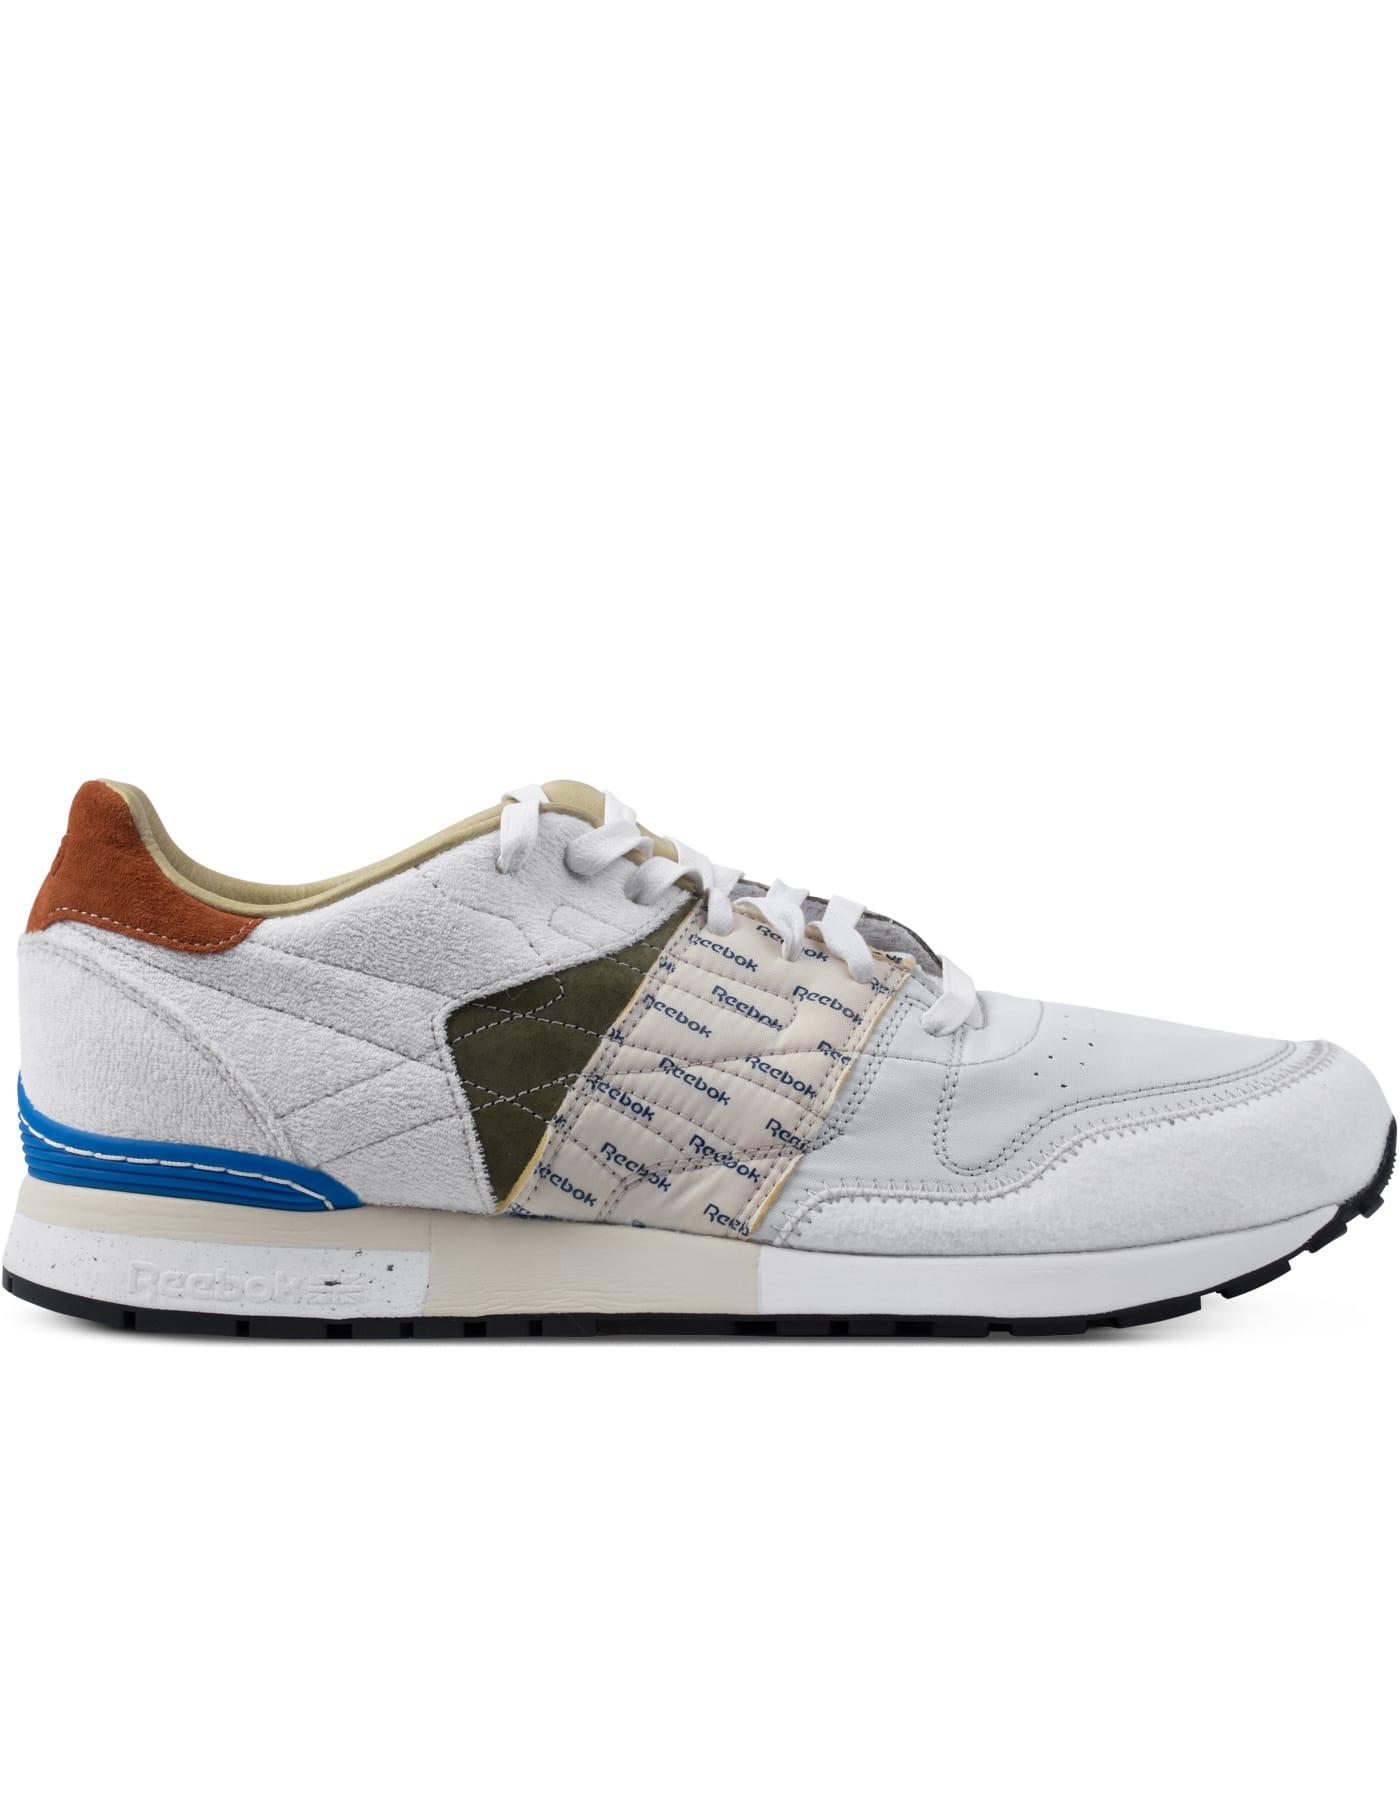 Reebok - GARBSTORE x Reebok White/Moss Green/Blue Classic Leather 6000 Sneakers